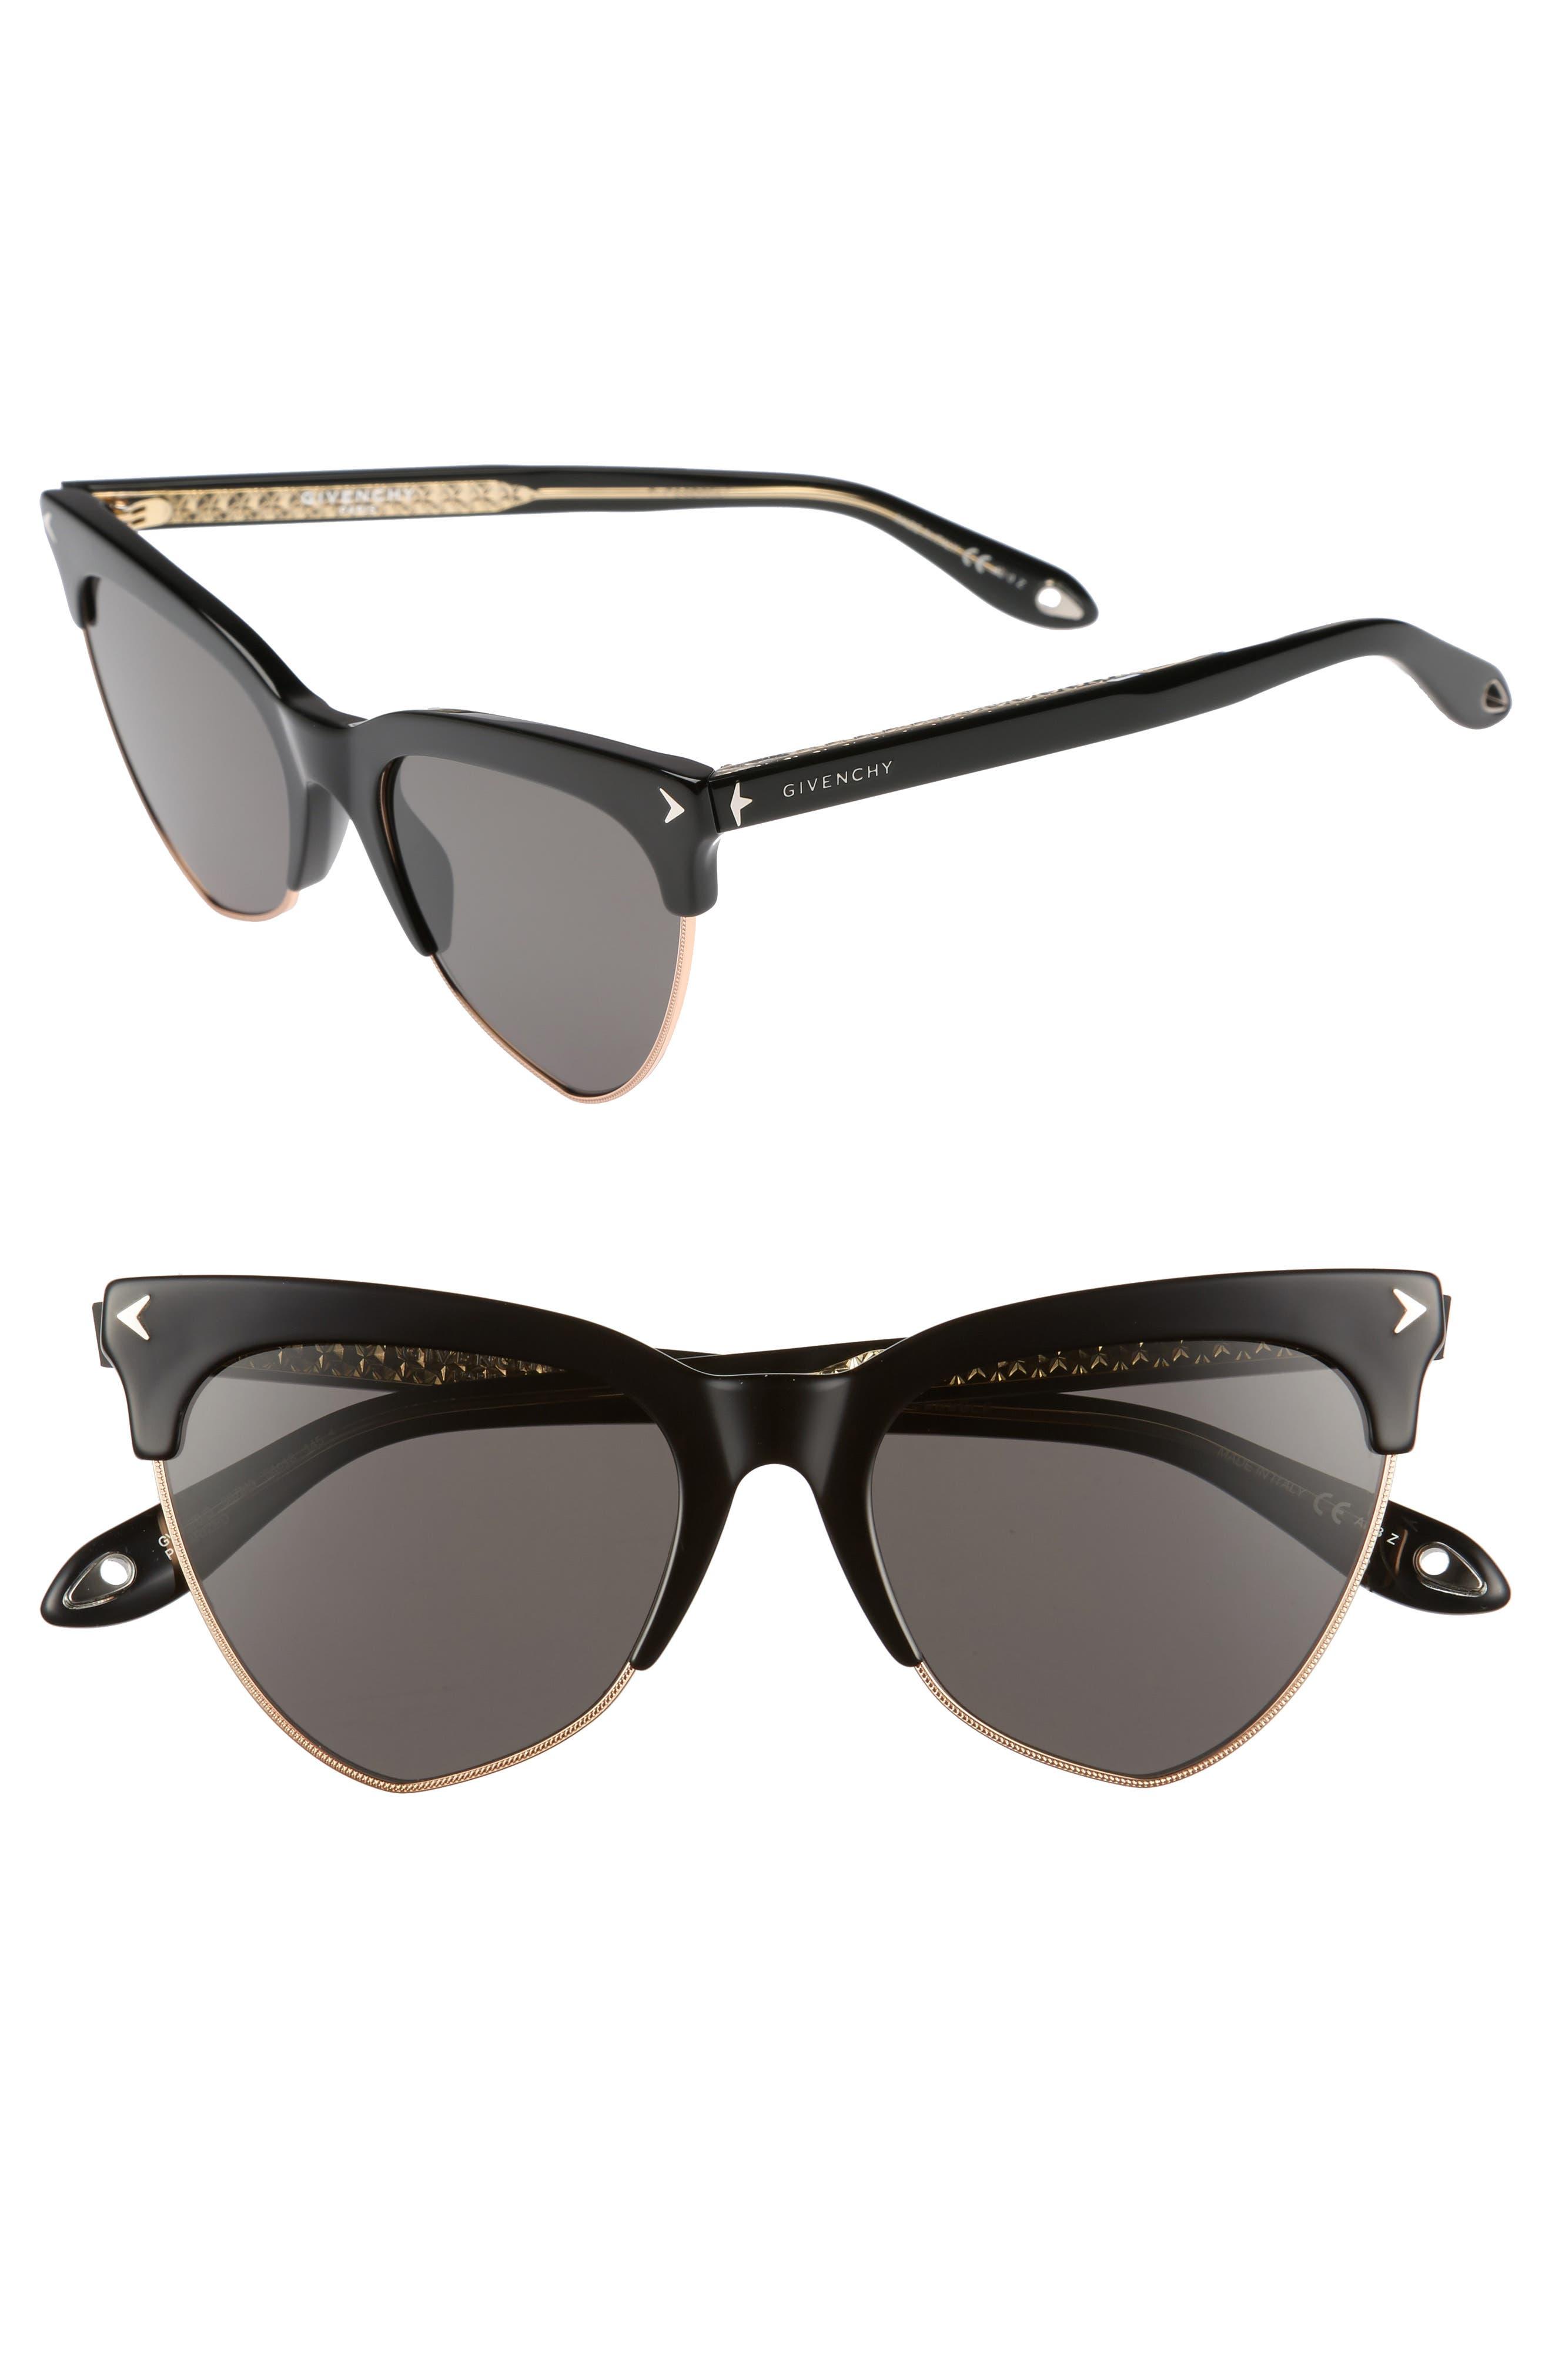 54mm Polarized Cat Eye Sunglasses,                         Main,                         color, 001